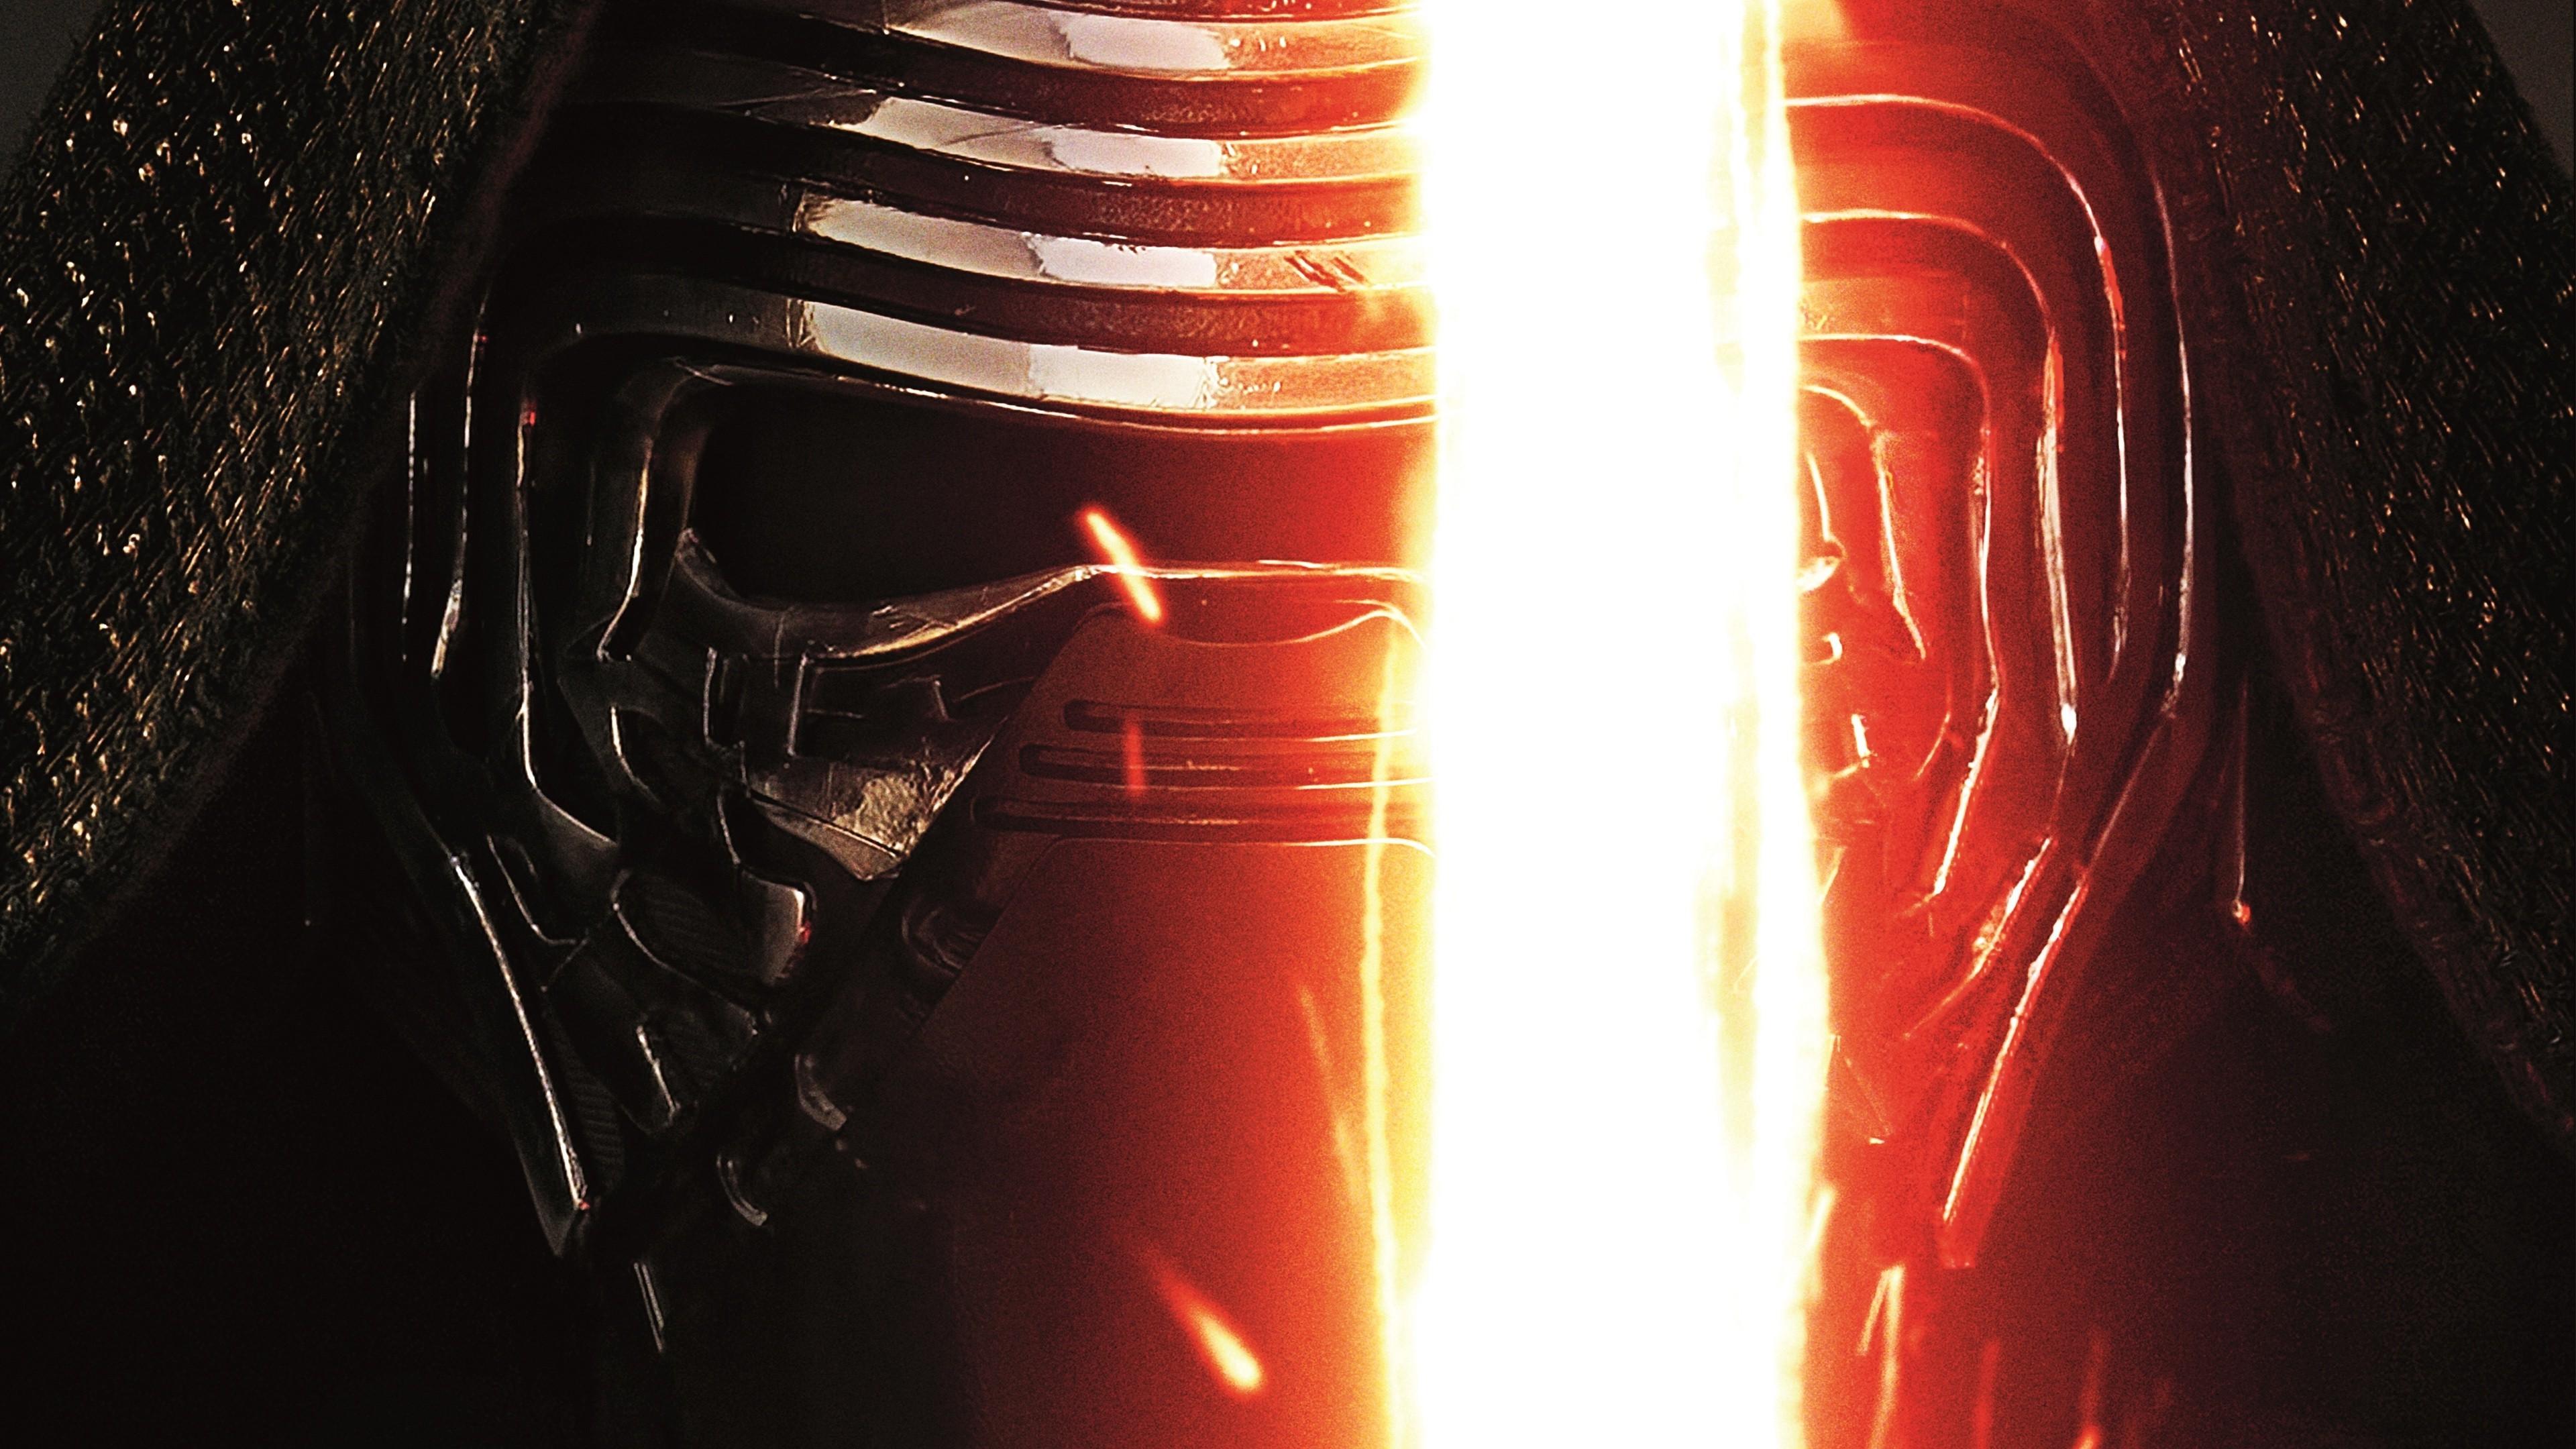 Kylo ren wallpaper hd download free cool backgrounds - Star wars the force awakens desktop wallpaper ...